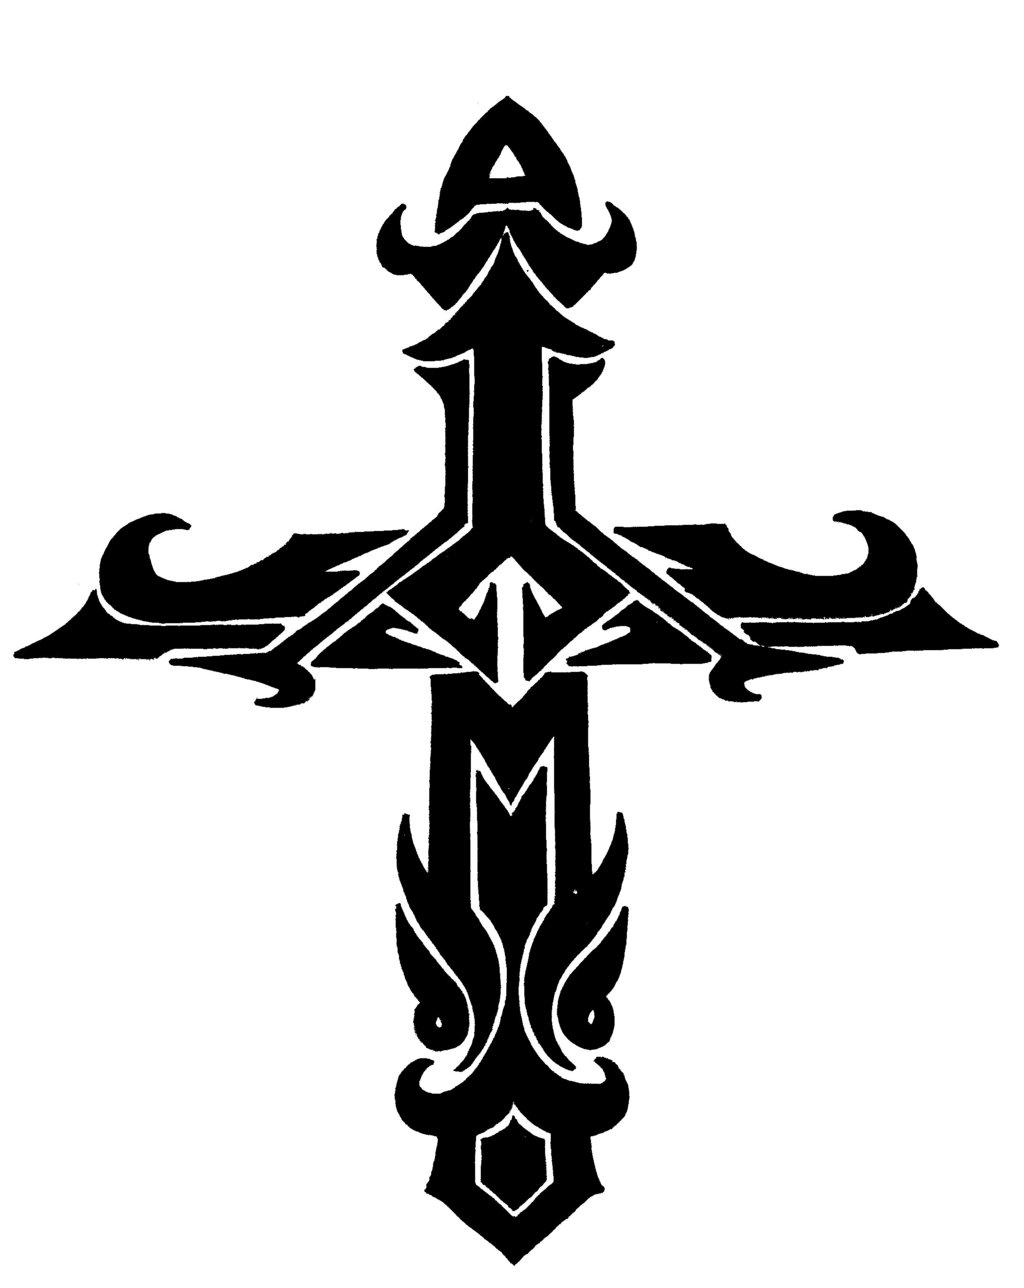 Cross Tattoo Transparent: Cross Transparent Background